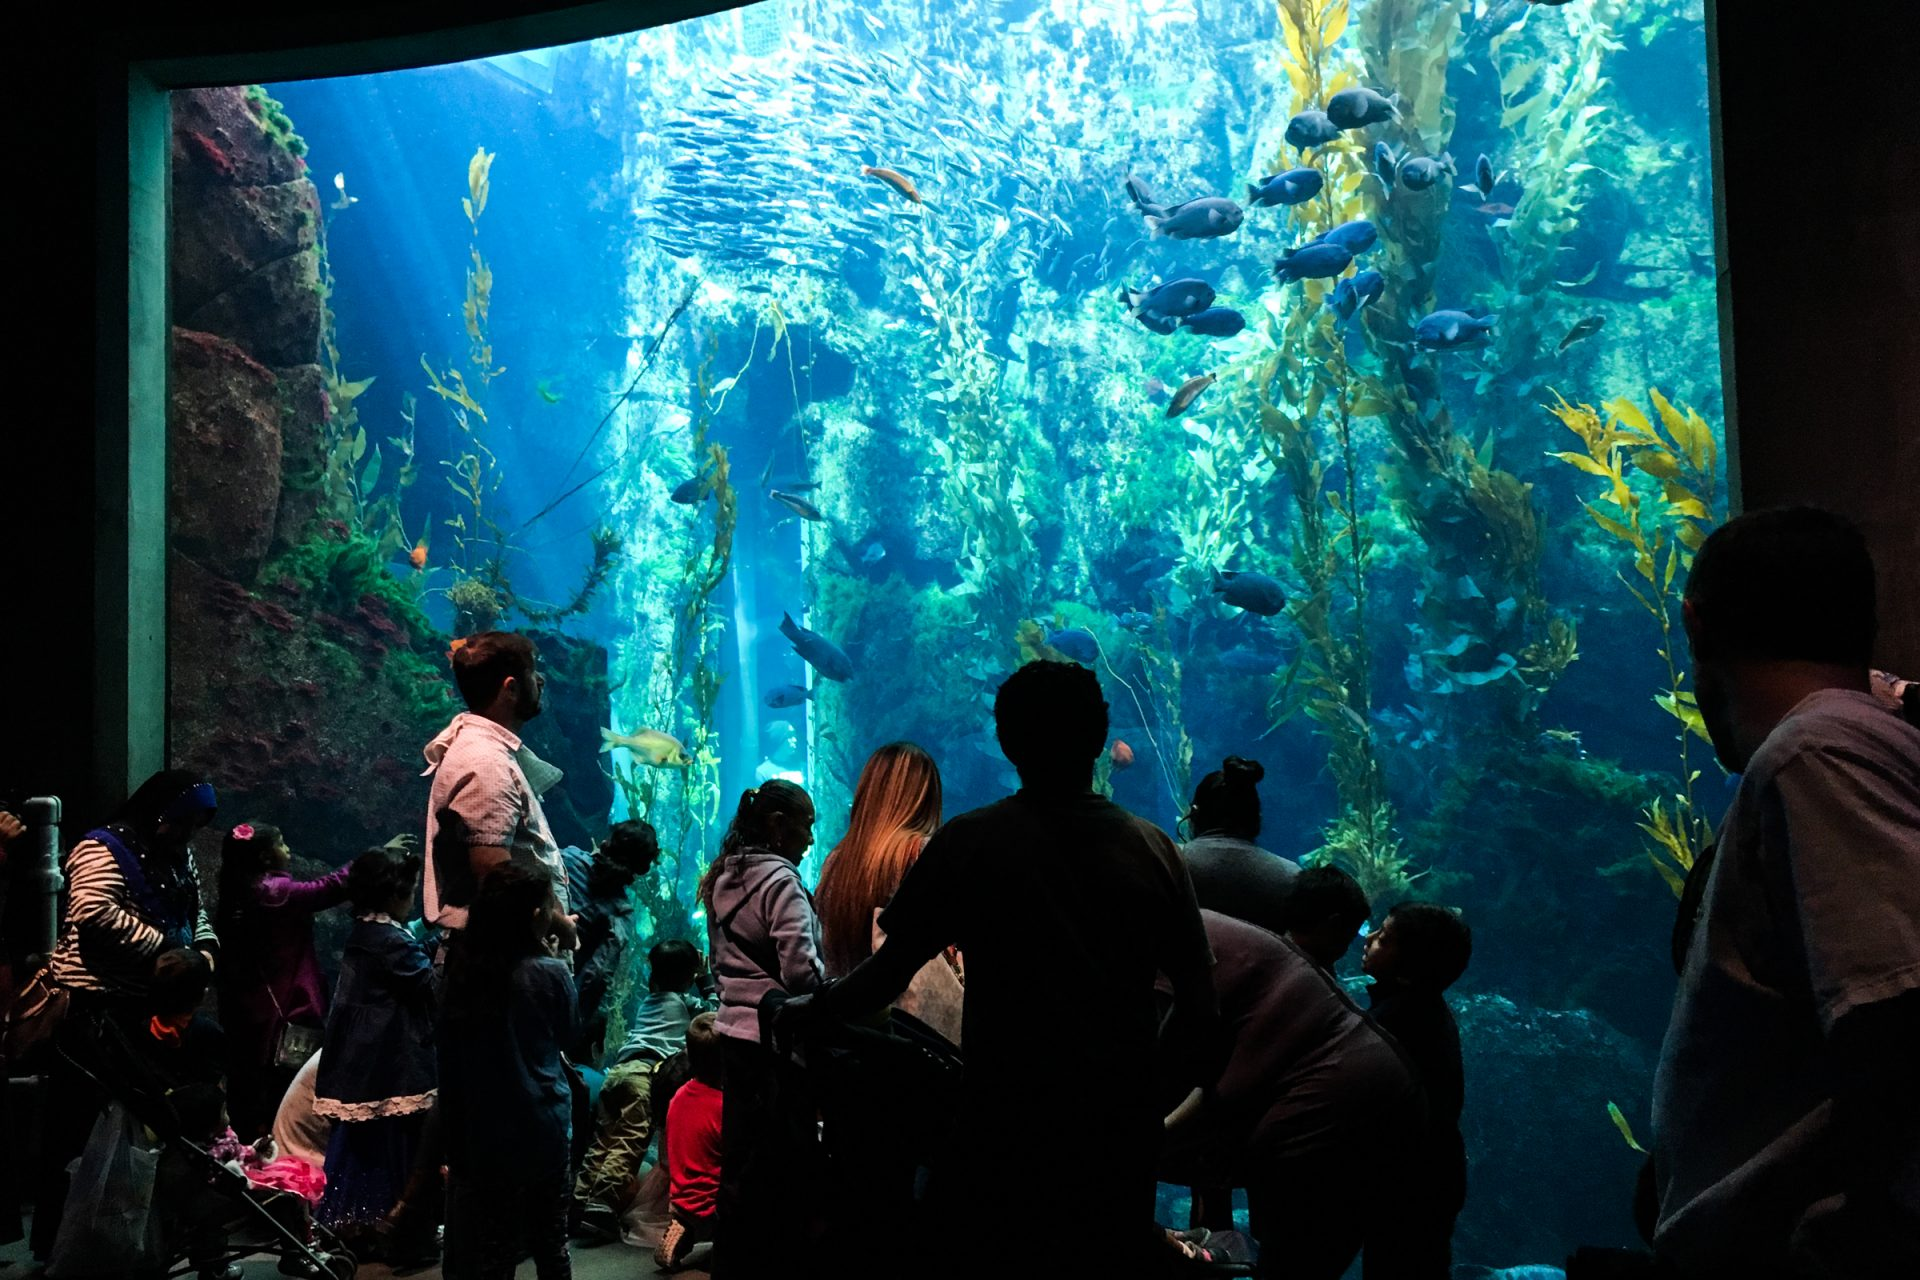 People Looking at Fish in Aquarium